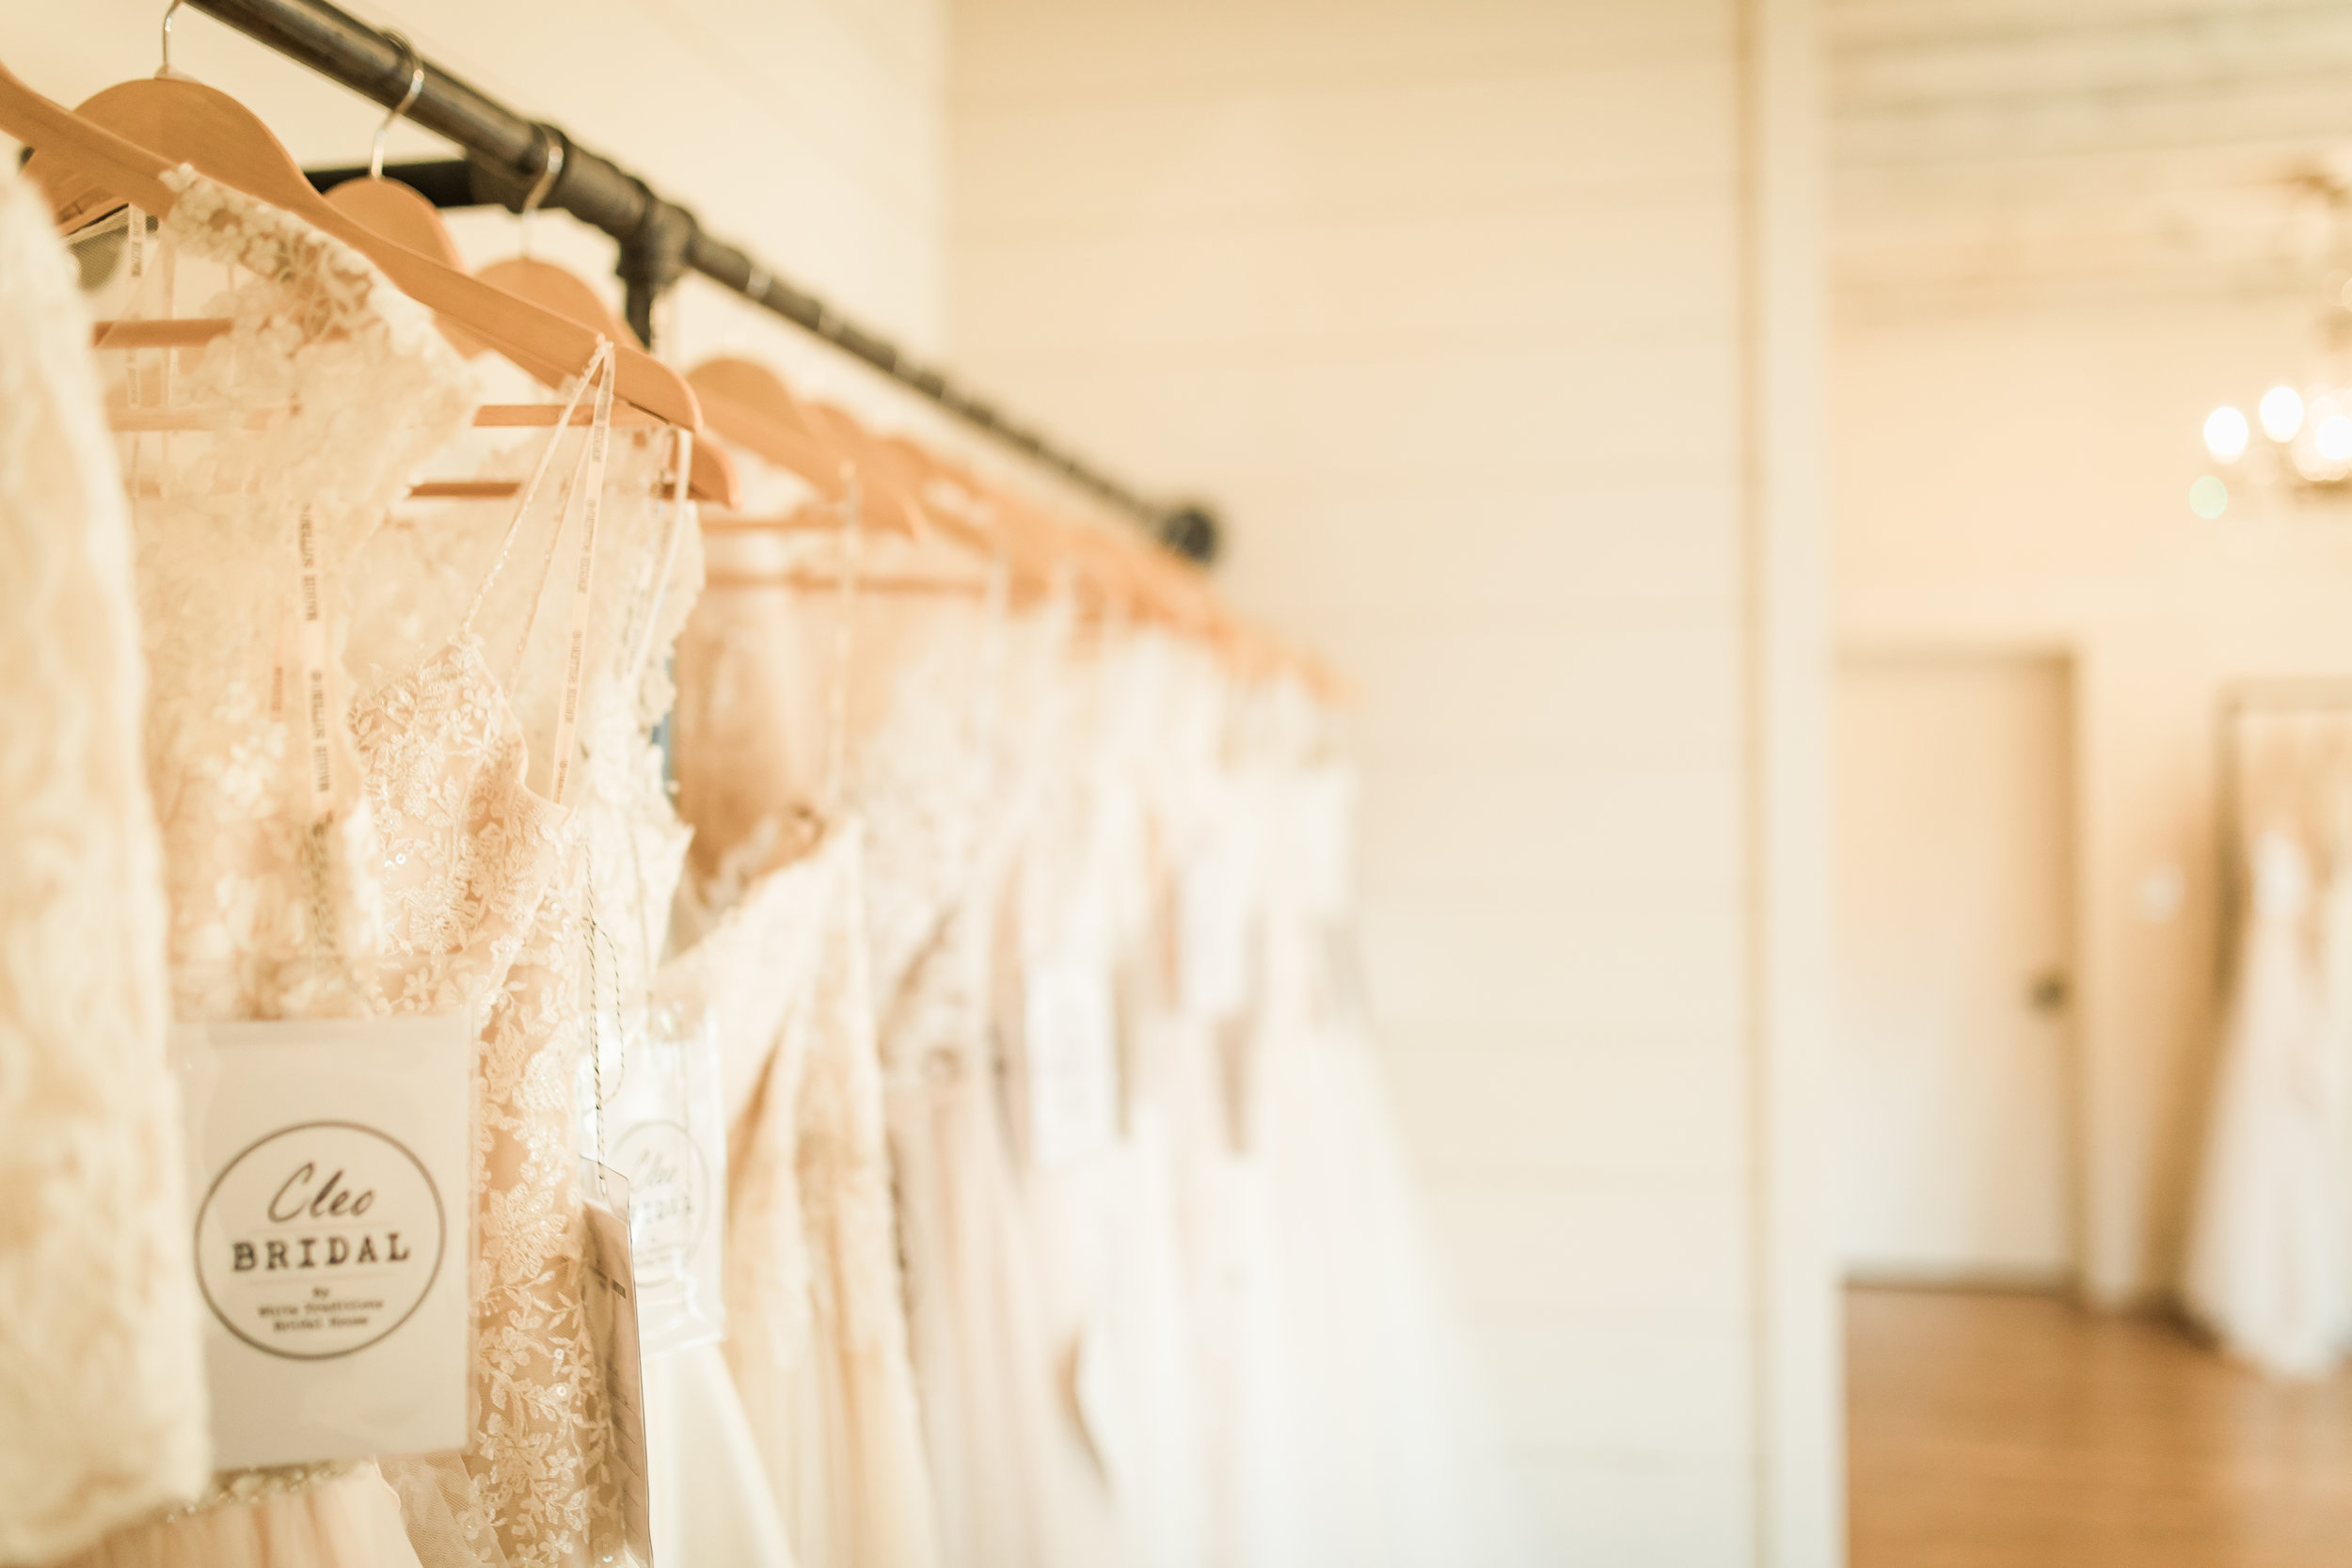 Cleo Bridal   White Traditions Sister-Store  O'Fallon, MO  Bridal Shop  Allison Slater Photography10.jpg